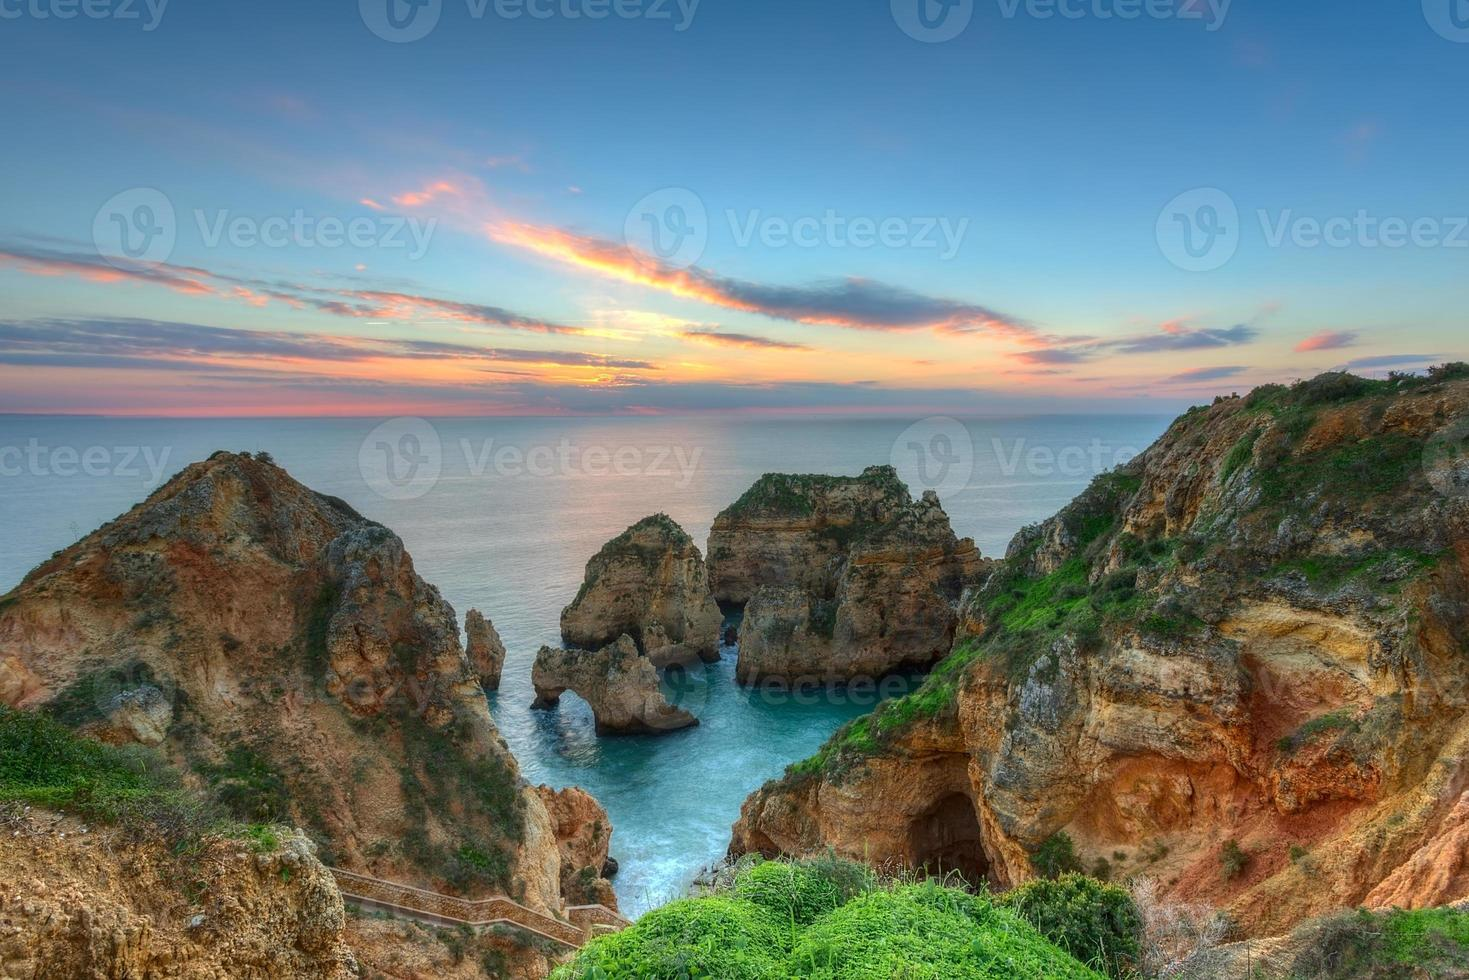 prachtige zee landschap zonsopgang. lagos, portugal, algarve. foto